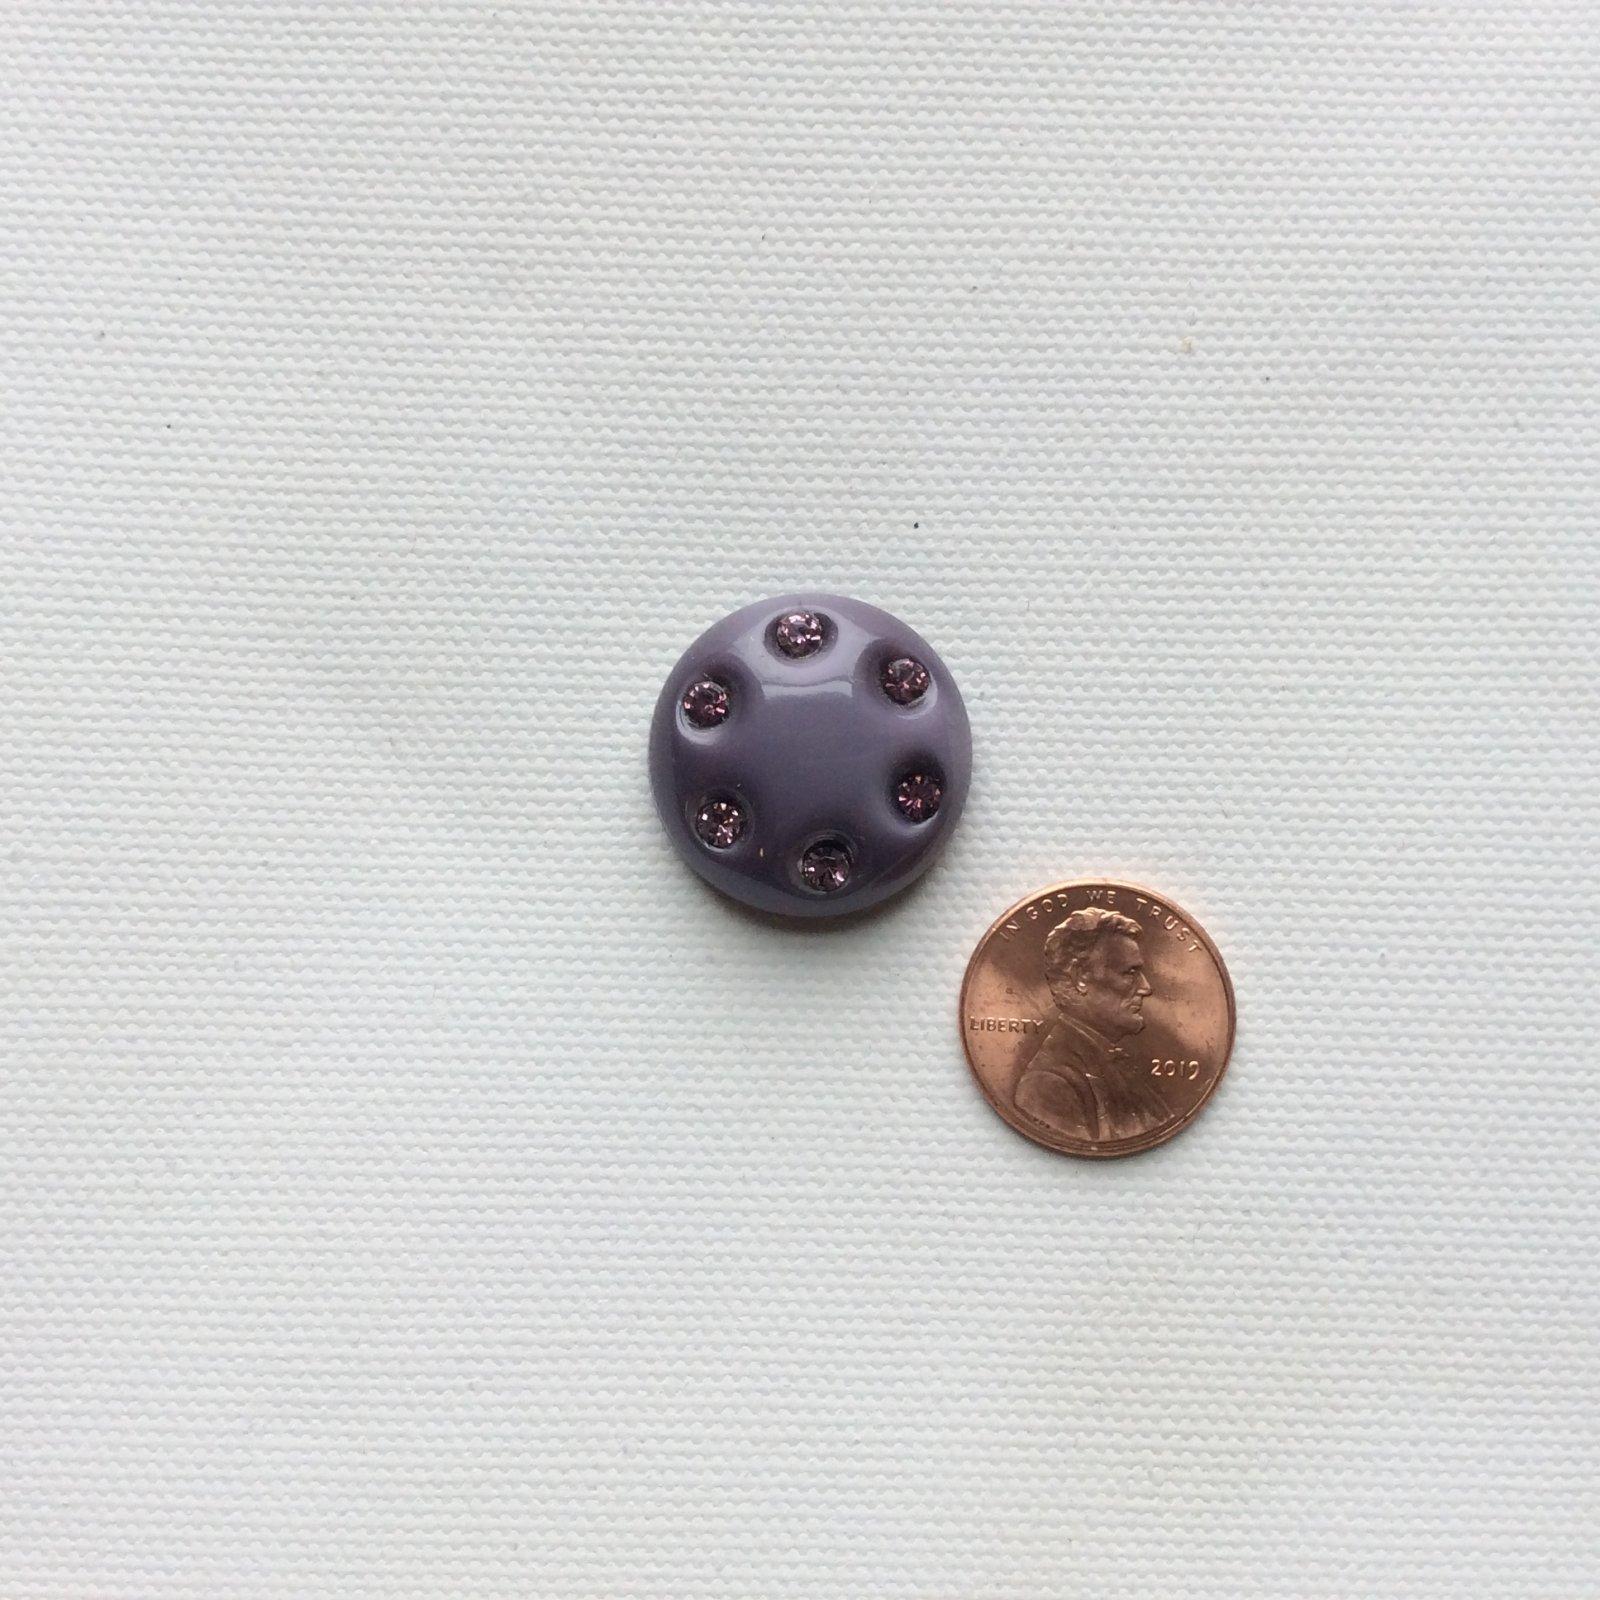 Czech Glass Light Purple with Purple Rhinestone Round Glass Sewing Button CZG09